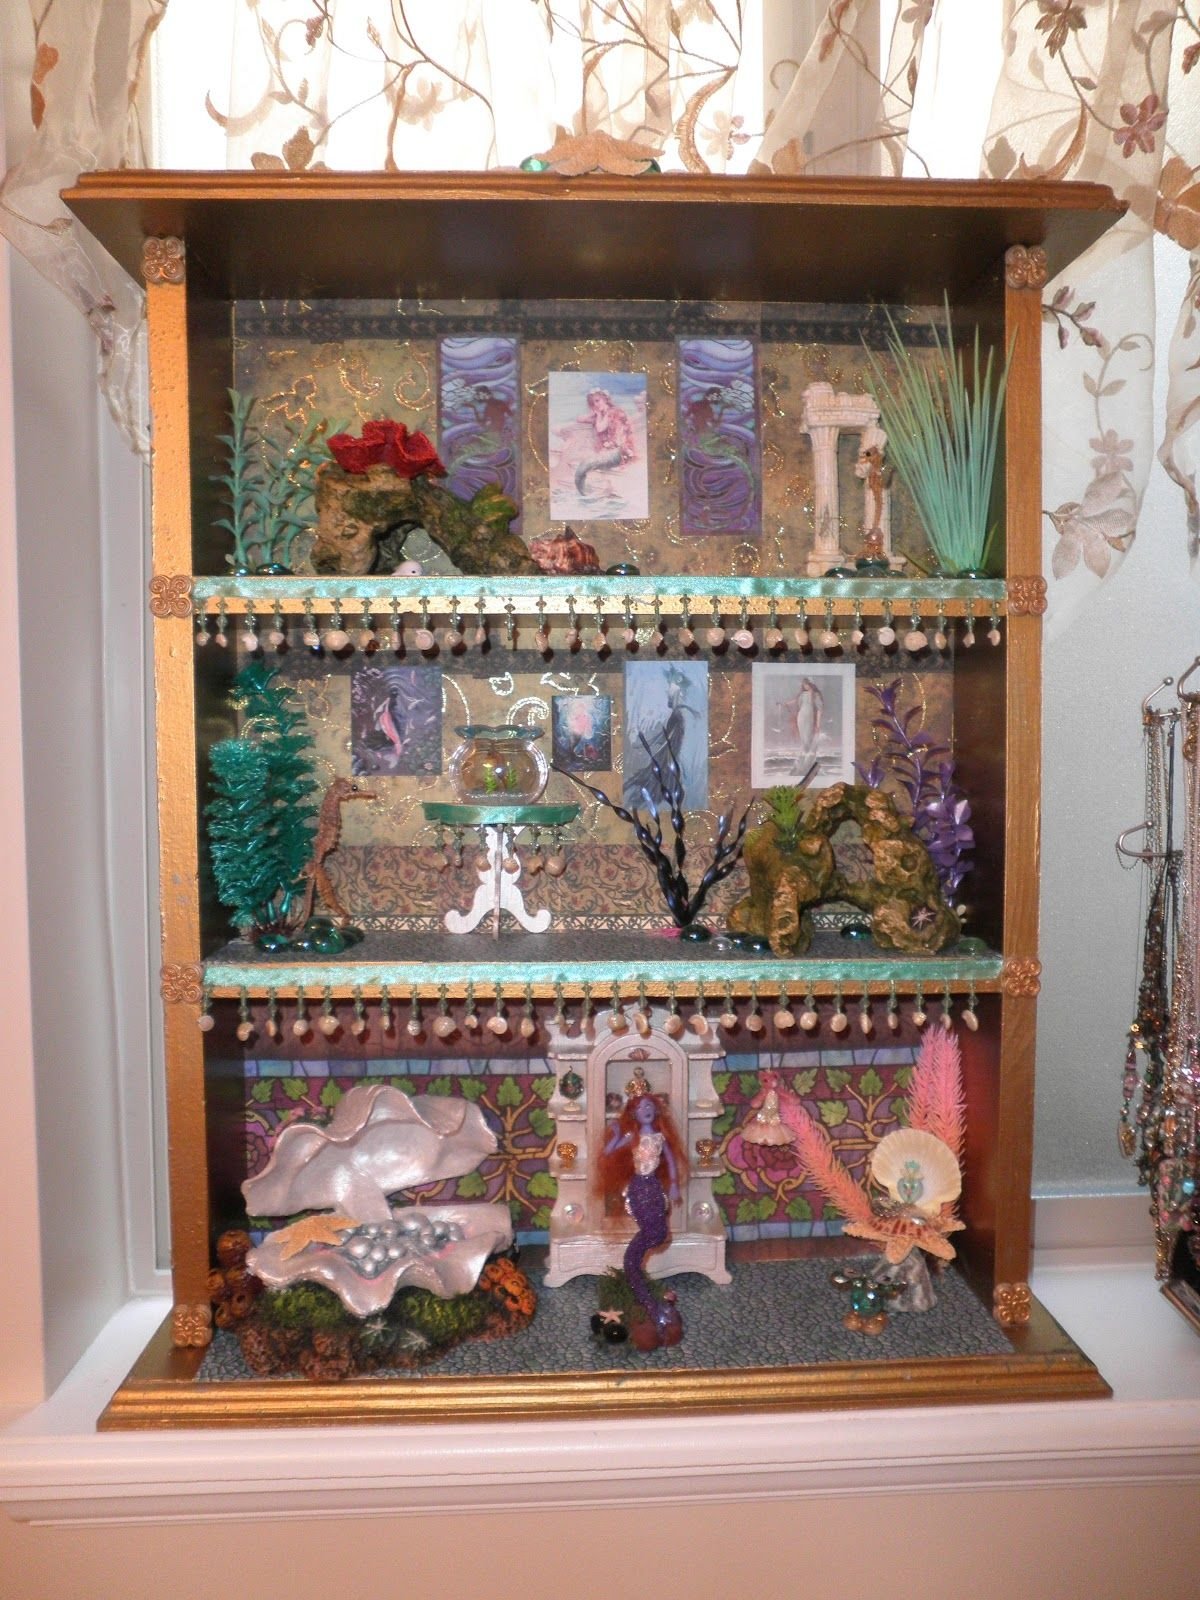 Miniature dollhouse Disney Princess book Barbie 1//12 Scale Inside out Movie